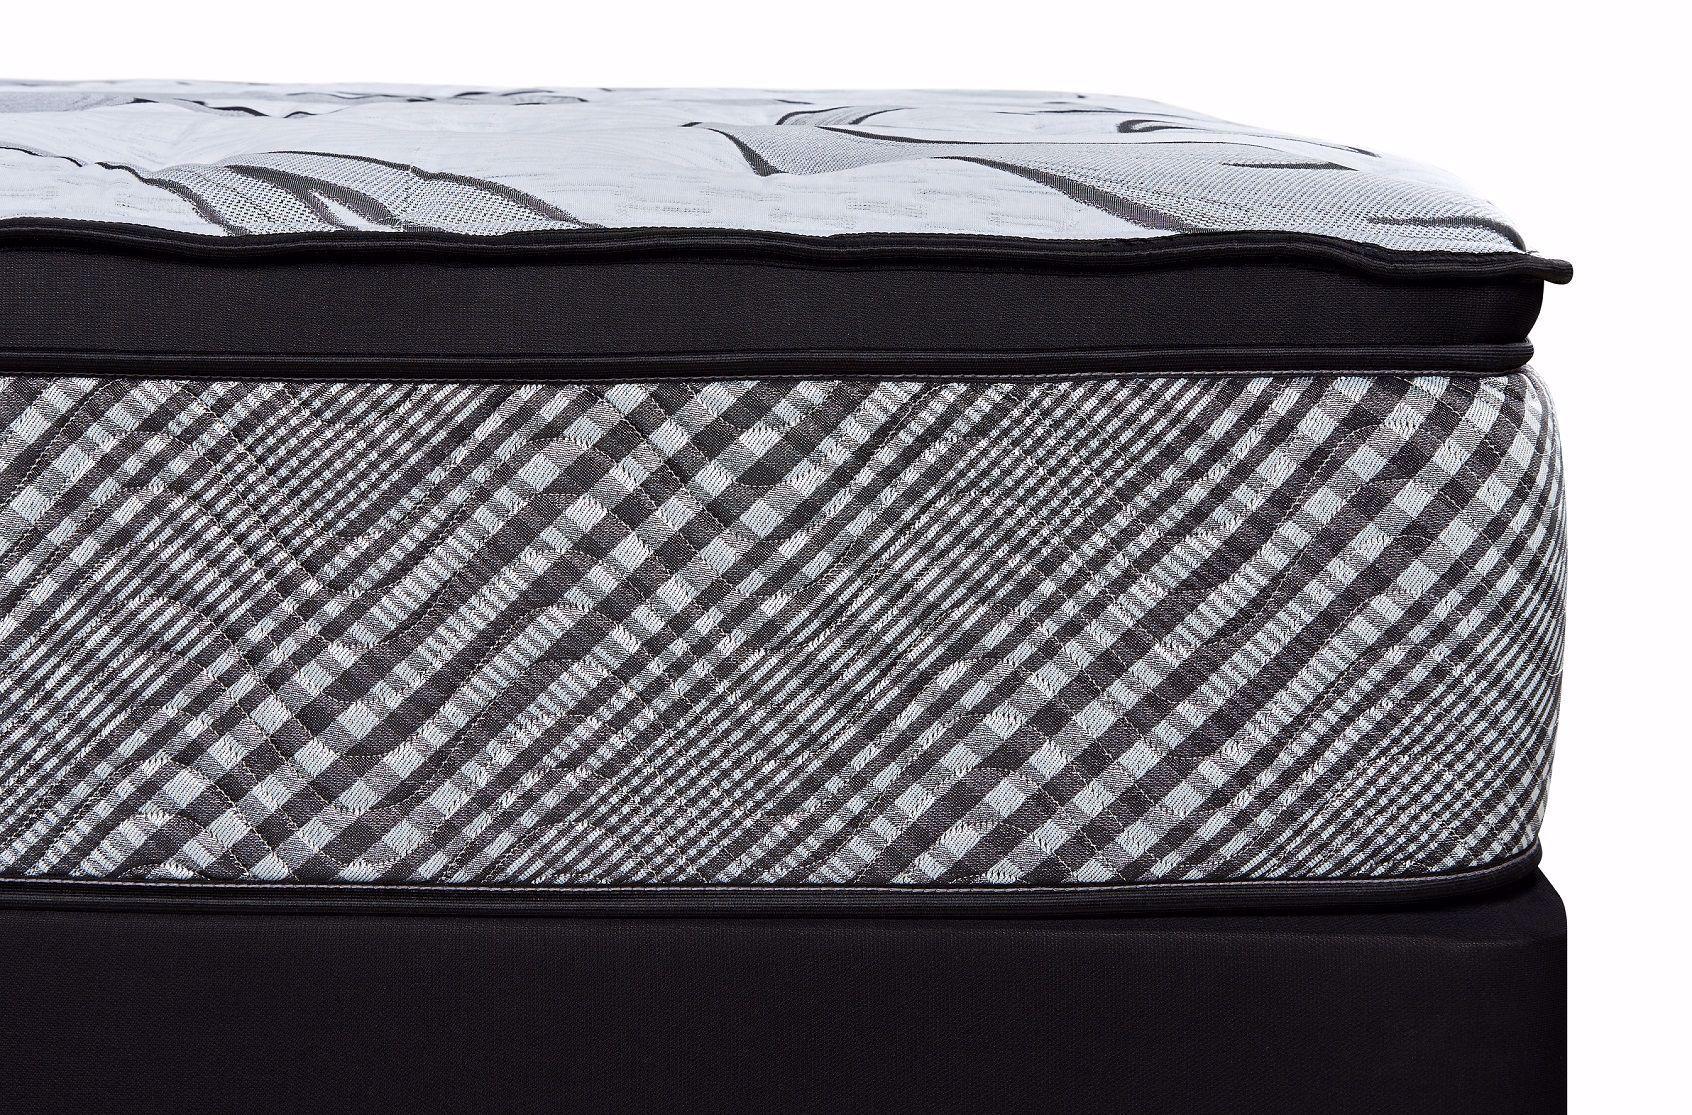 Picture of Restonic Darlington EuroTop Twin XL Mattress